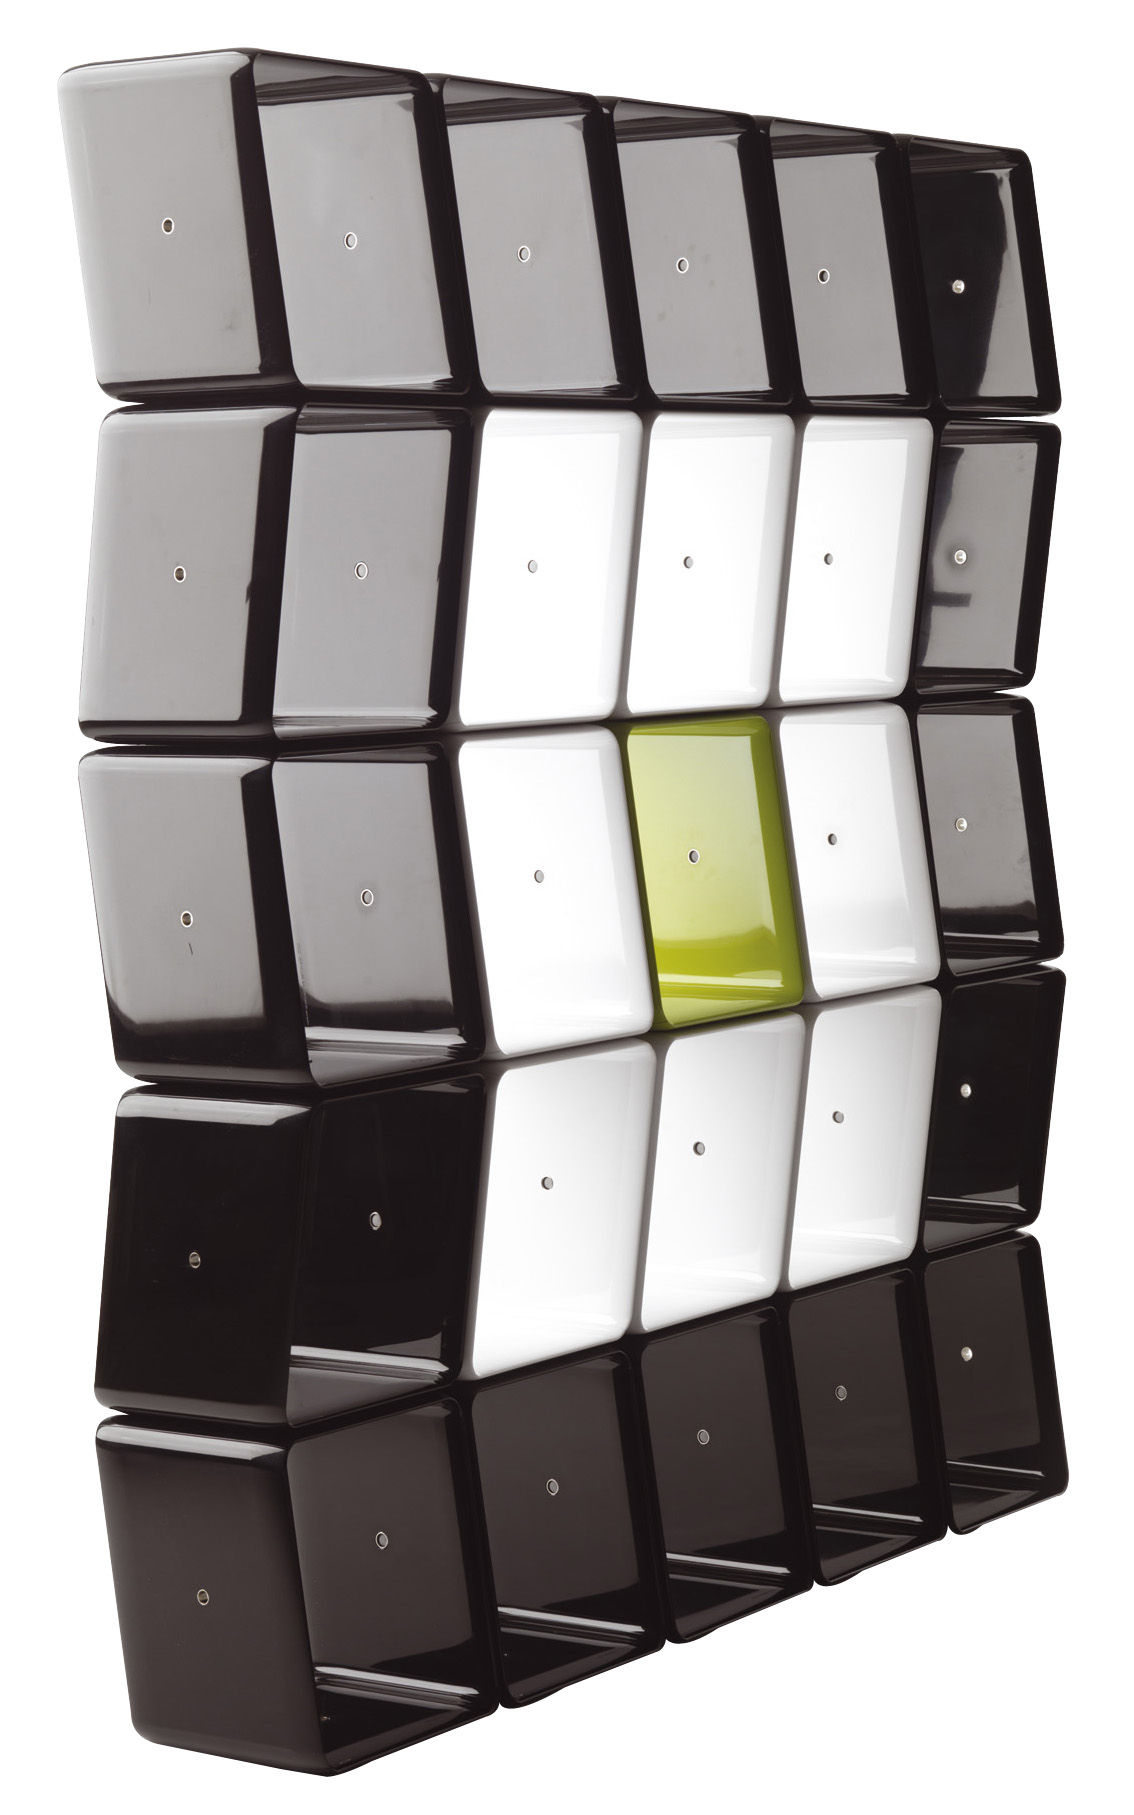 etag re obo cube modulaire noir cerruti baleri made in design. Black Bedroom Furniture Sets. Home Design Ideas